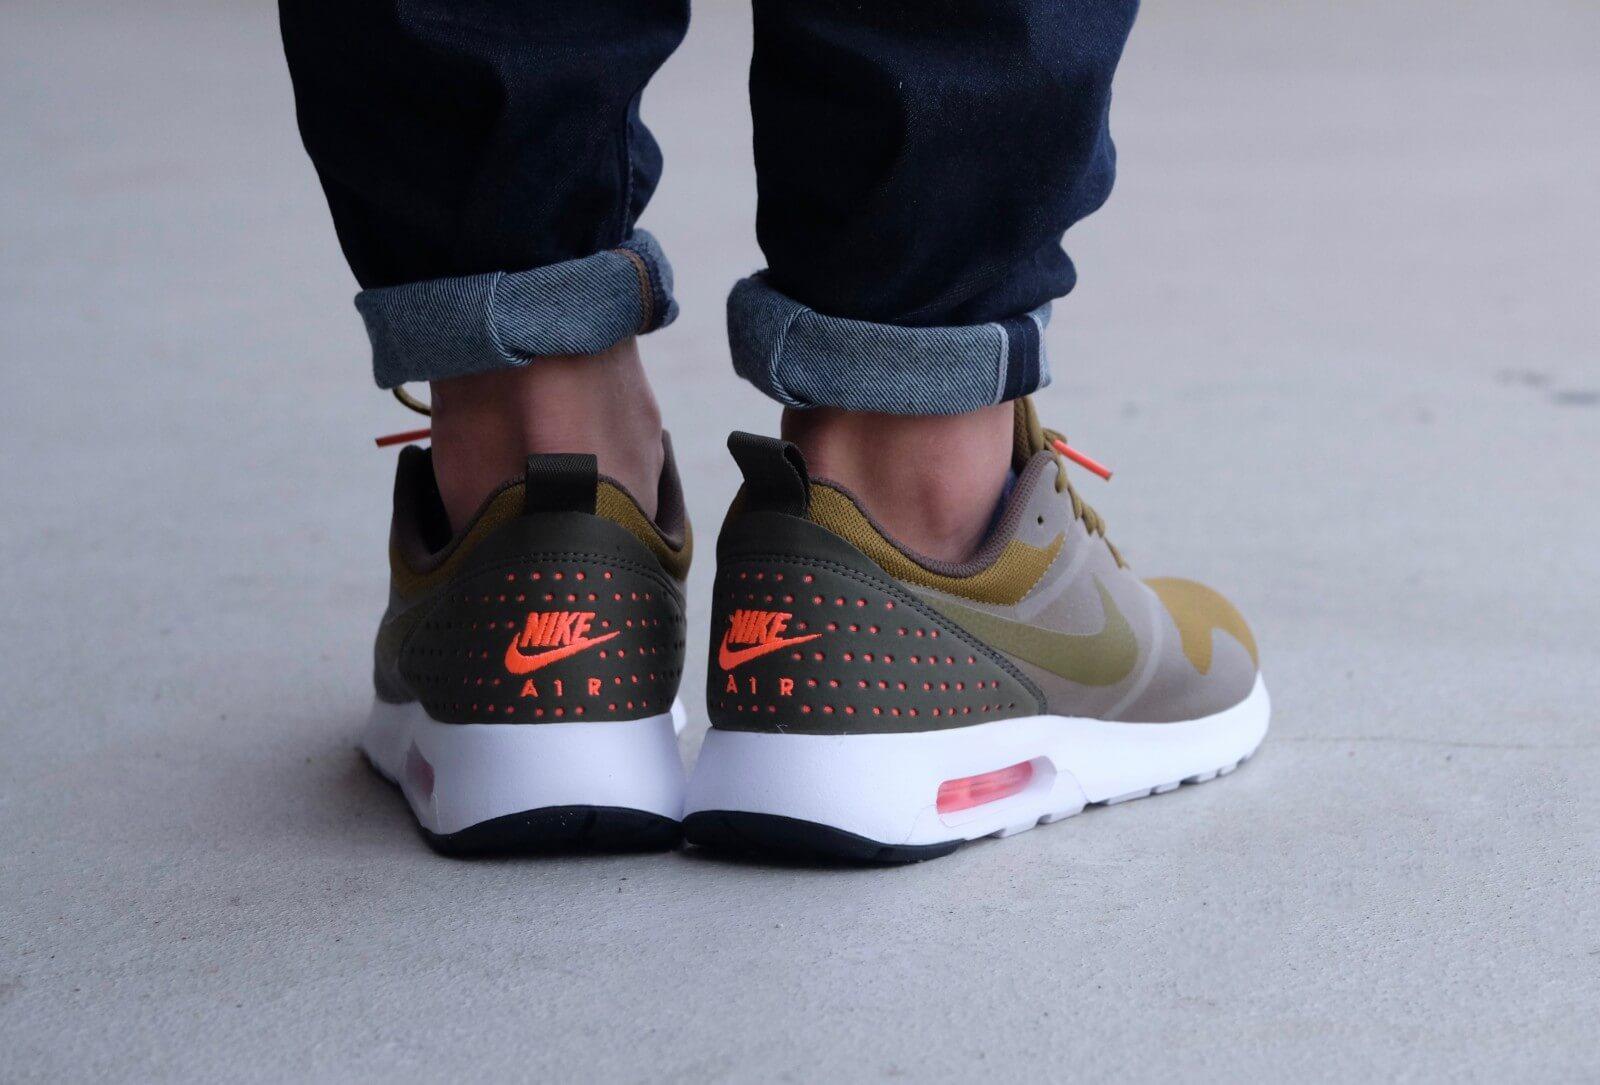 40509445ce8 ... 705149-304 Sneakers Pinterest Air max Nike Air Max Tavas Olive Flak  Dark Loden ...